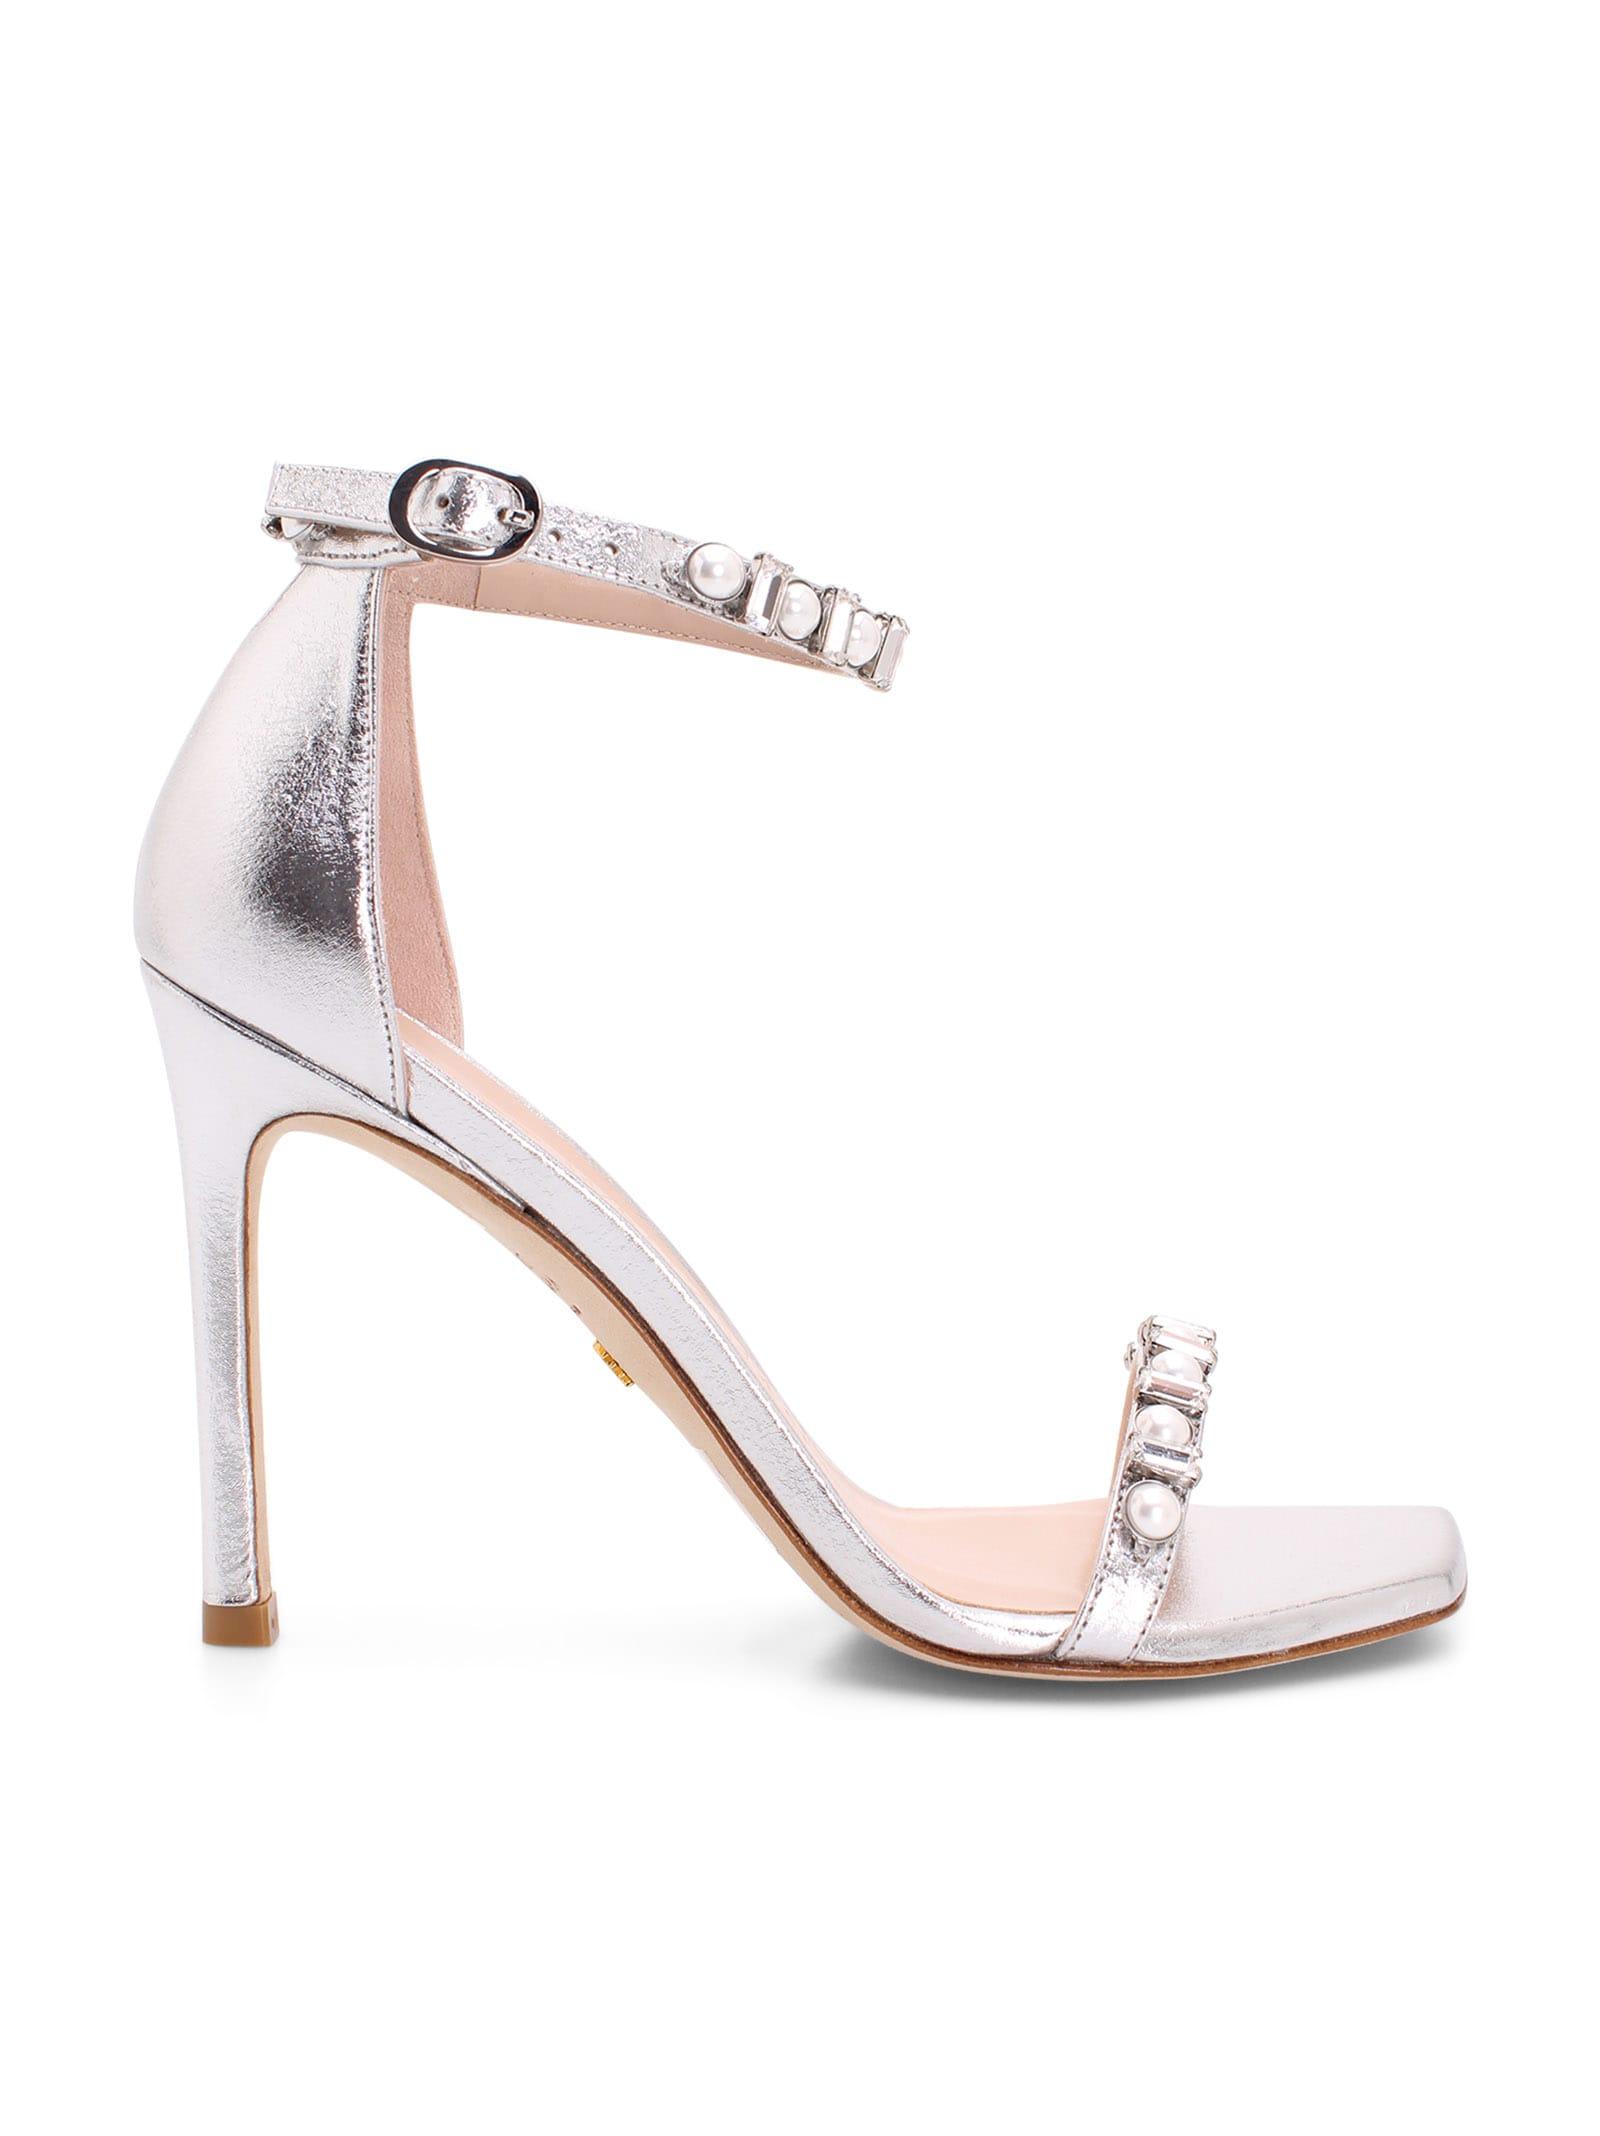 Buy Stuart Weitzman amelina Leather Sandals online, shop Stuart Weitzman shoes with free shipping